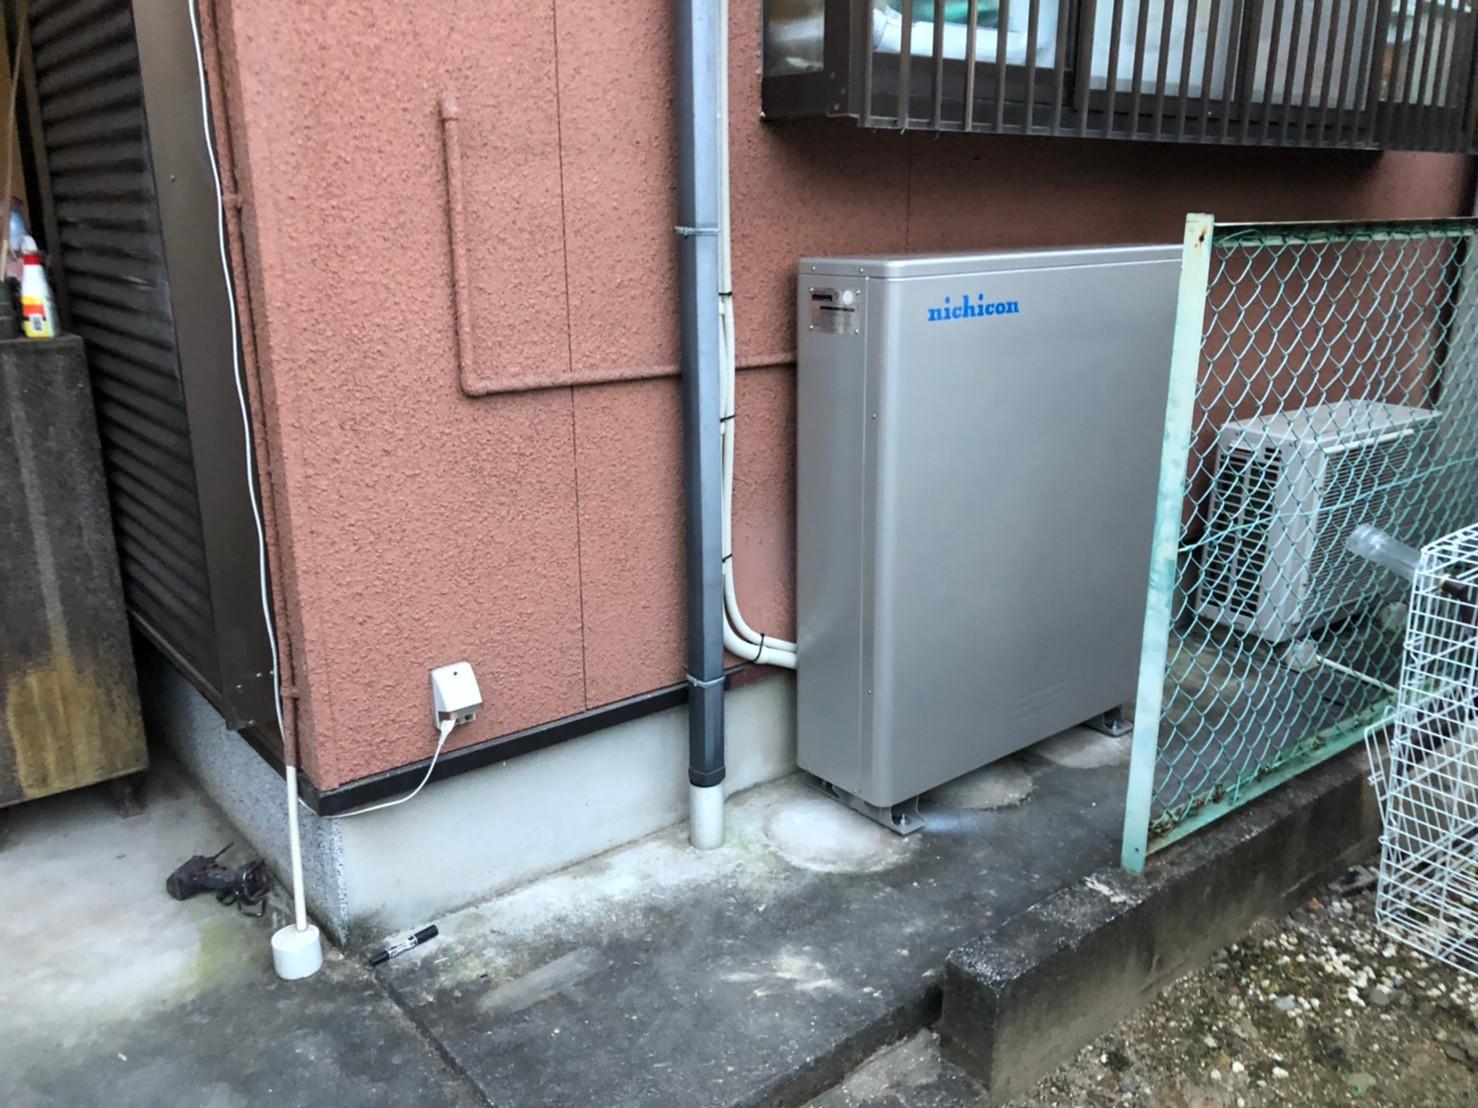 兵庫県nichicon蓄電池ESS-U2L1施工後の写真